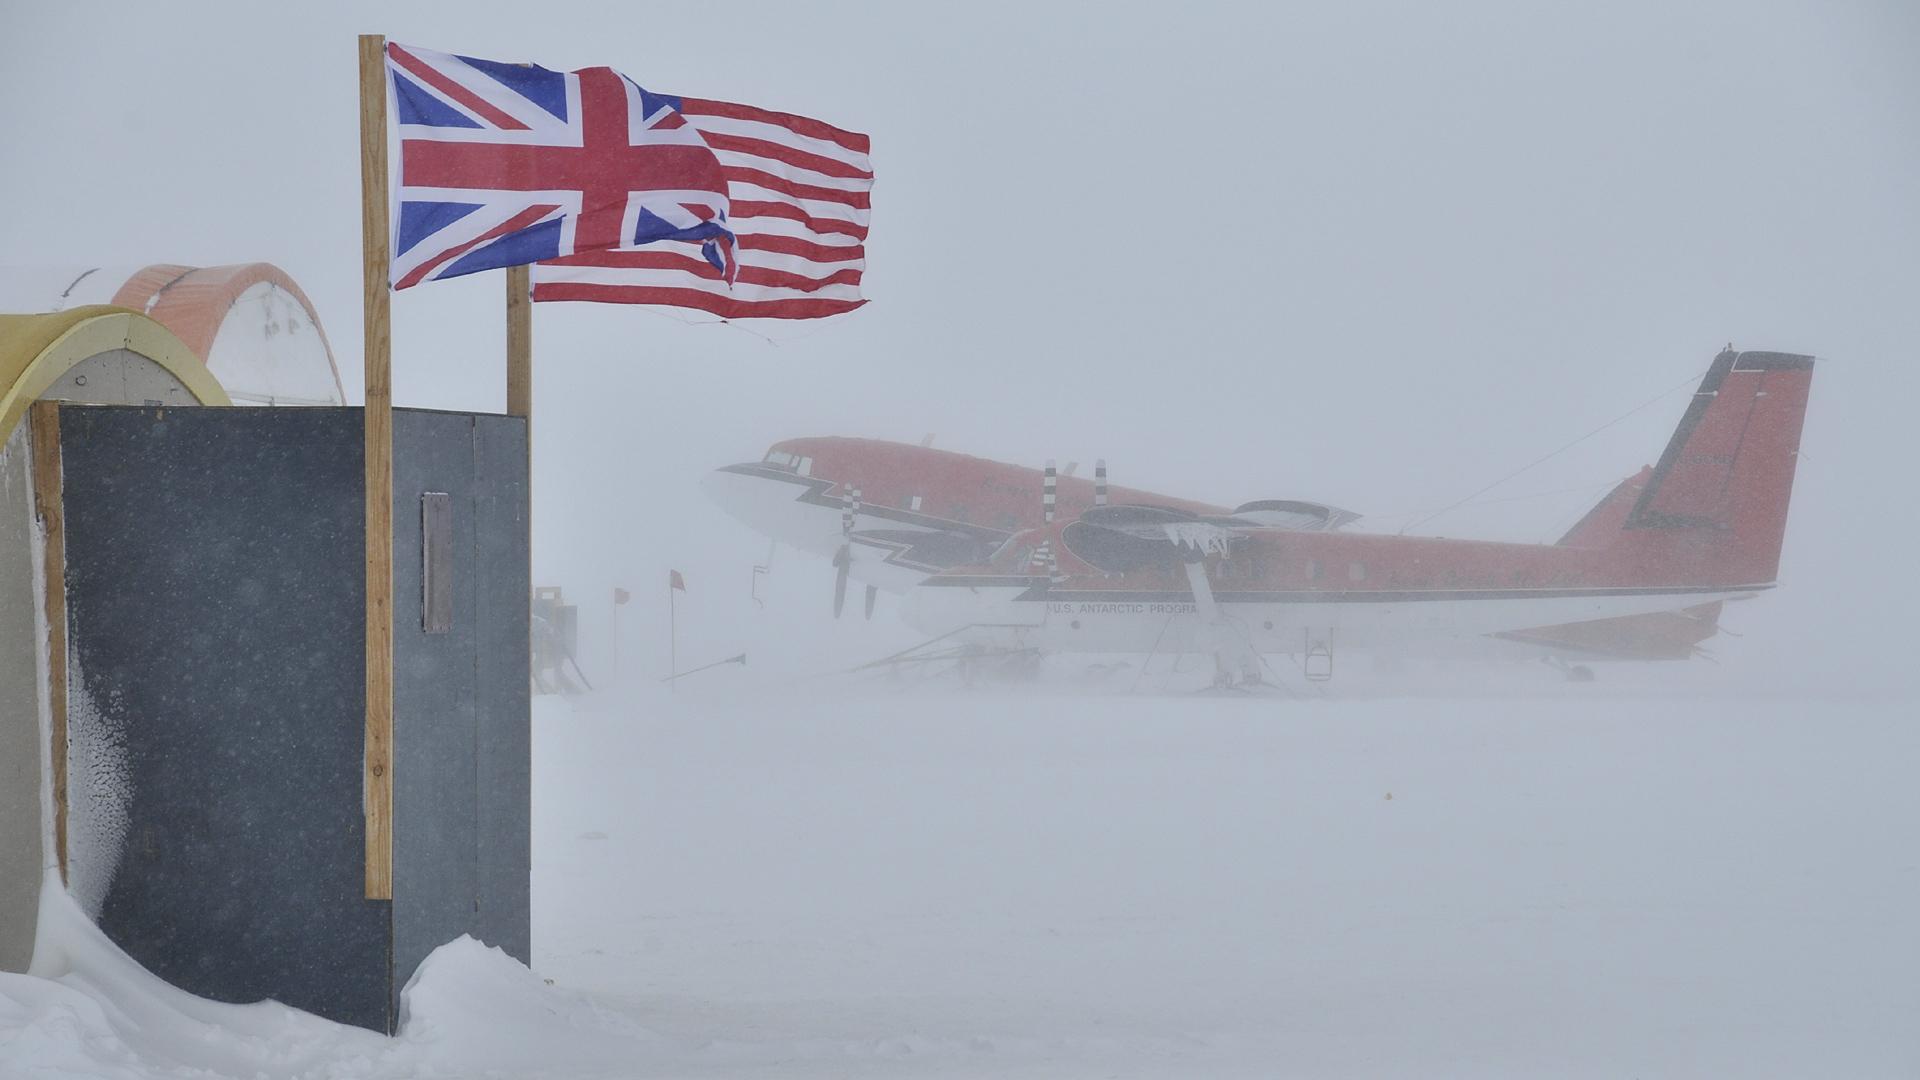 Plane seen through a blizzard on the ground